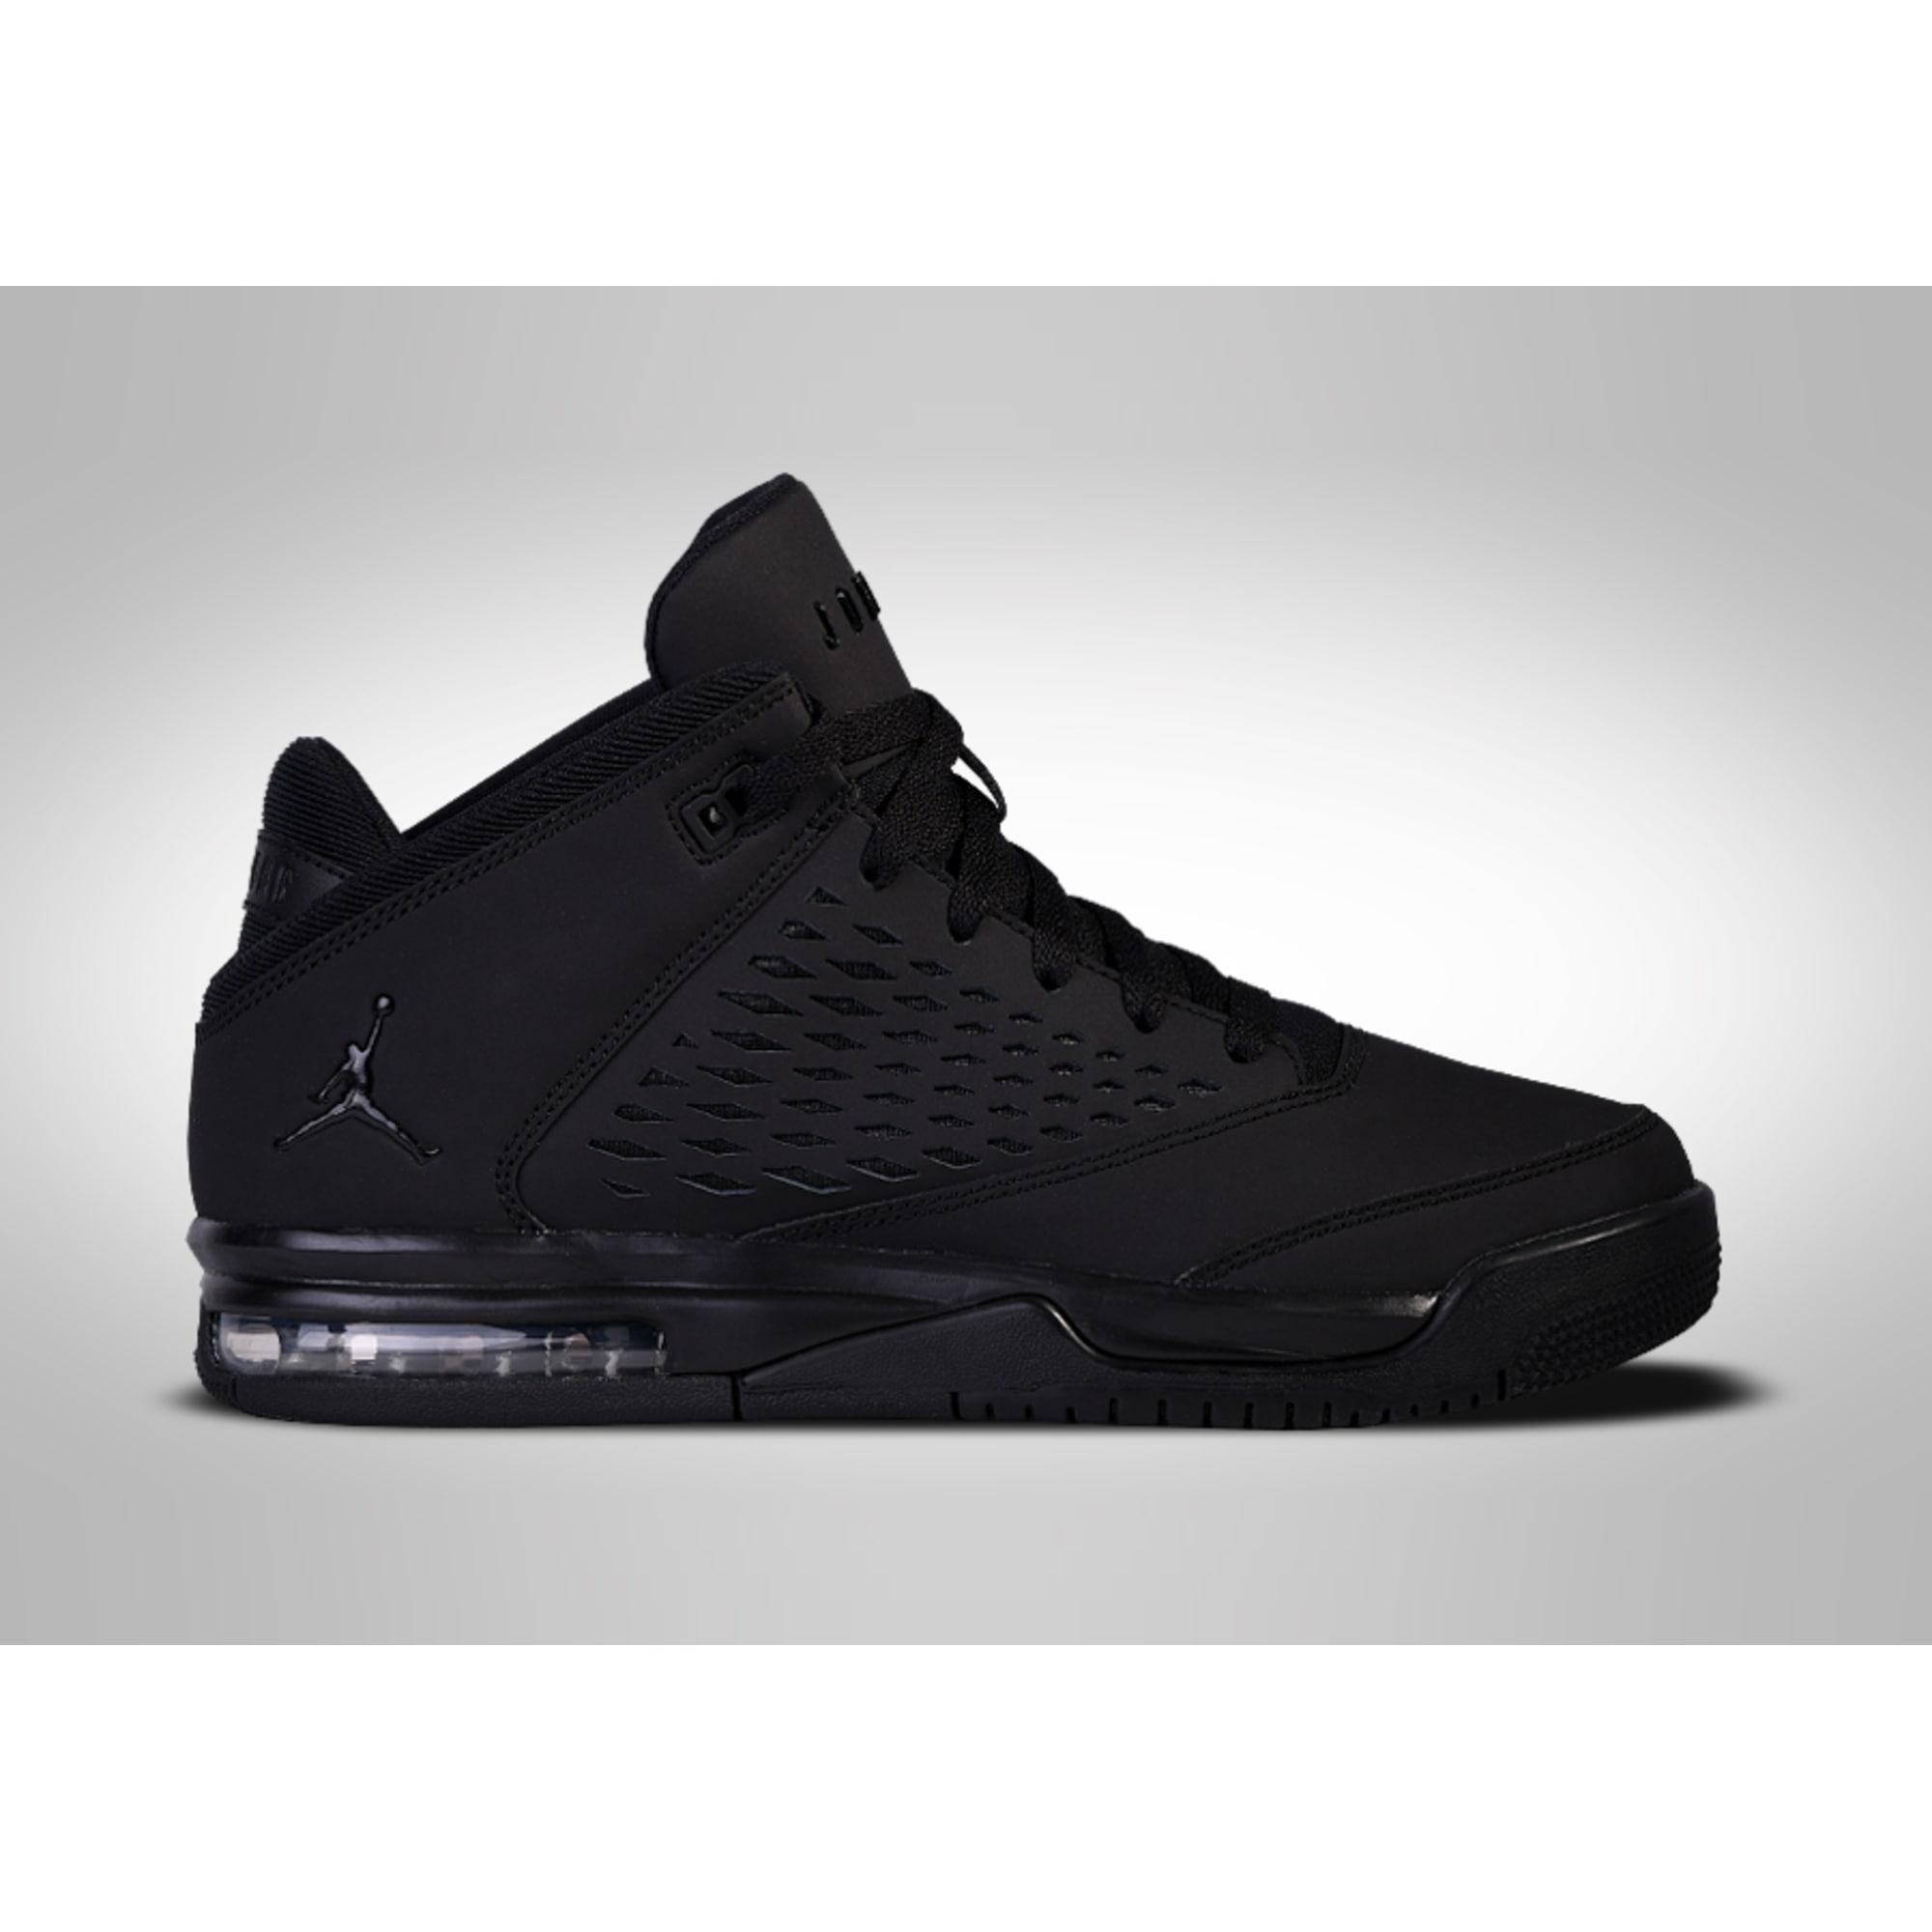 Jordan Par 7872886 44 Baskets Noir Vendu Suieton YD9eE2IbWH